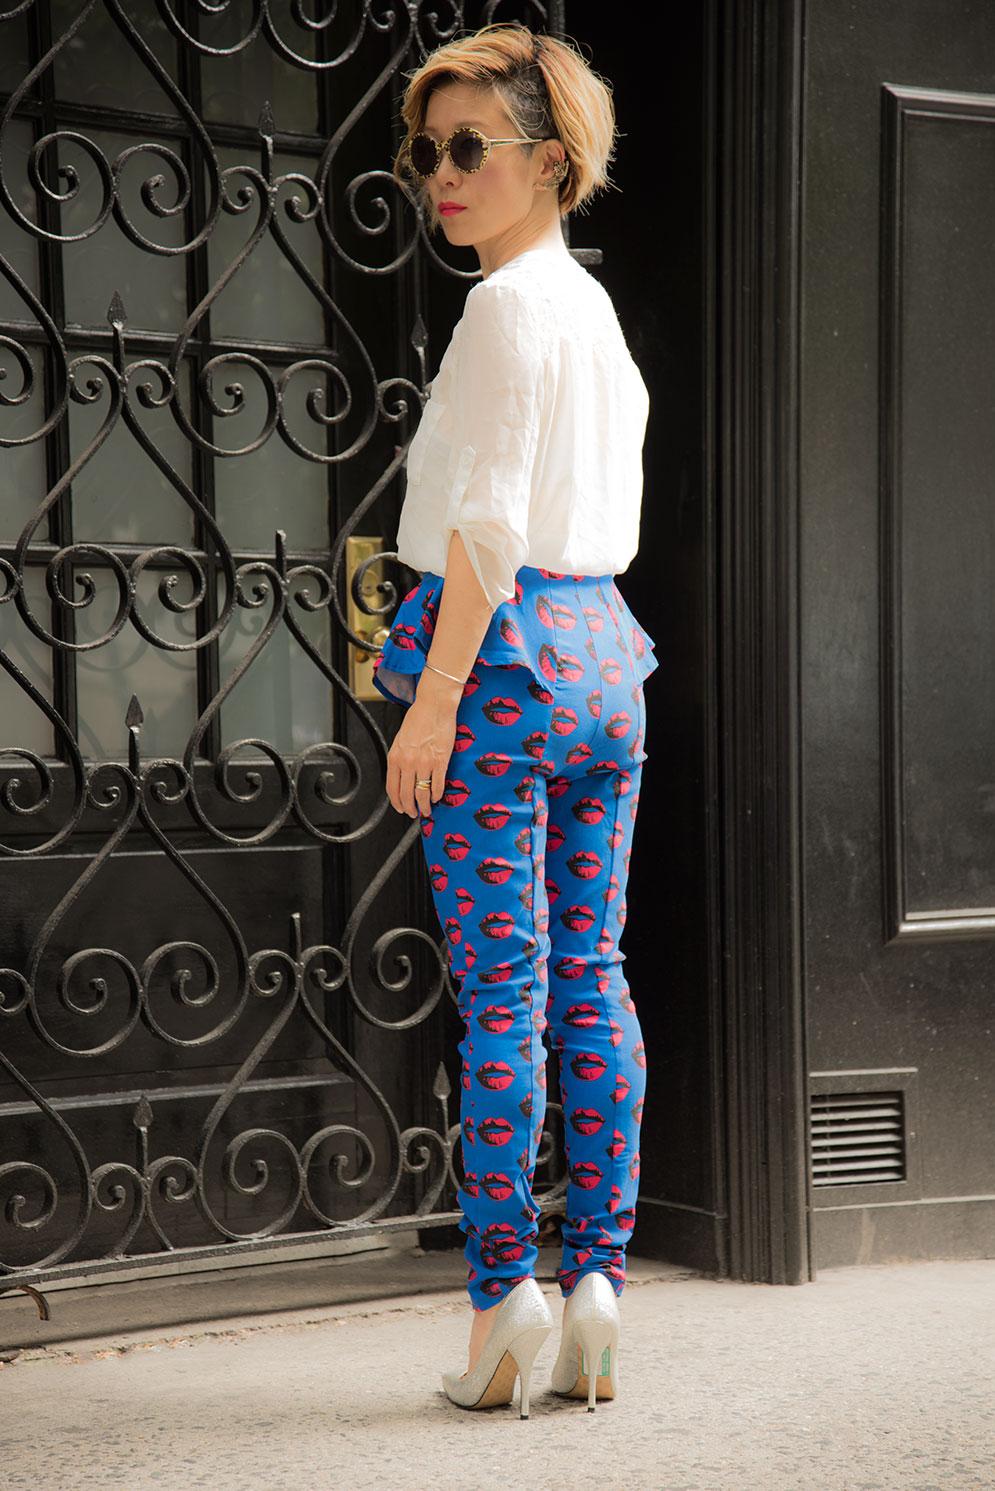 ROCK MAMA NYC LIFESTYLE BLOG - LETS ENJOY FASHION ROCK MAMA NYC LIFESTYLE BLOG - lets enjoy fashion